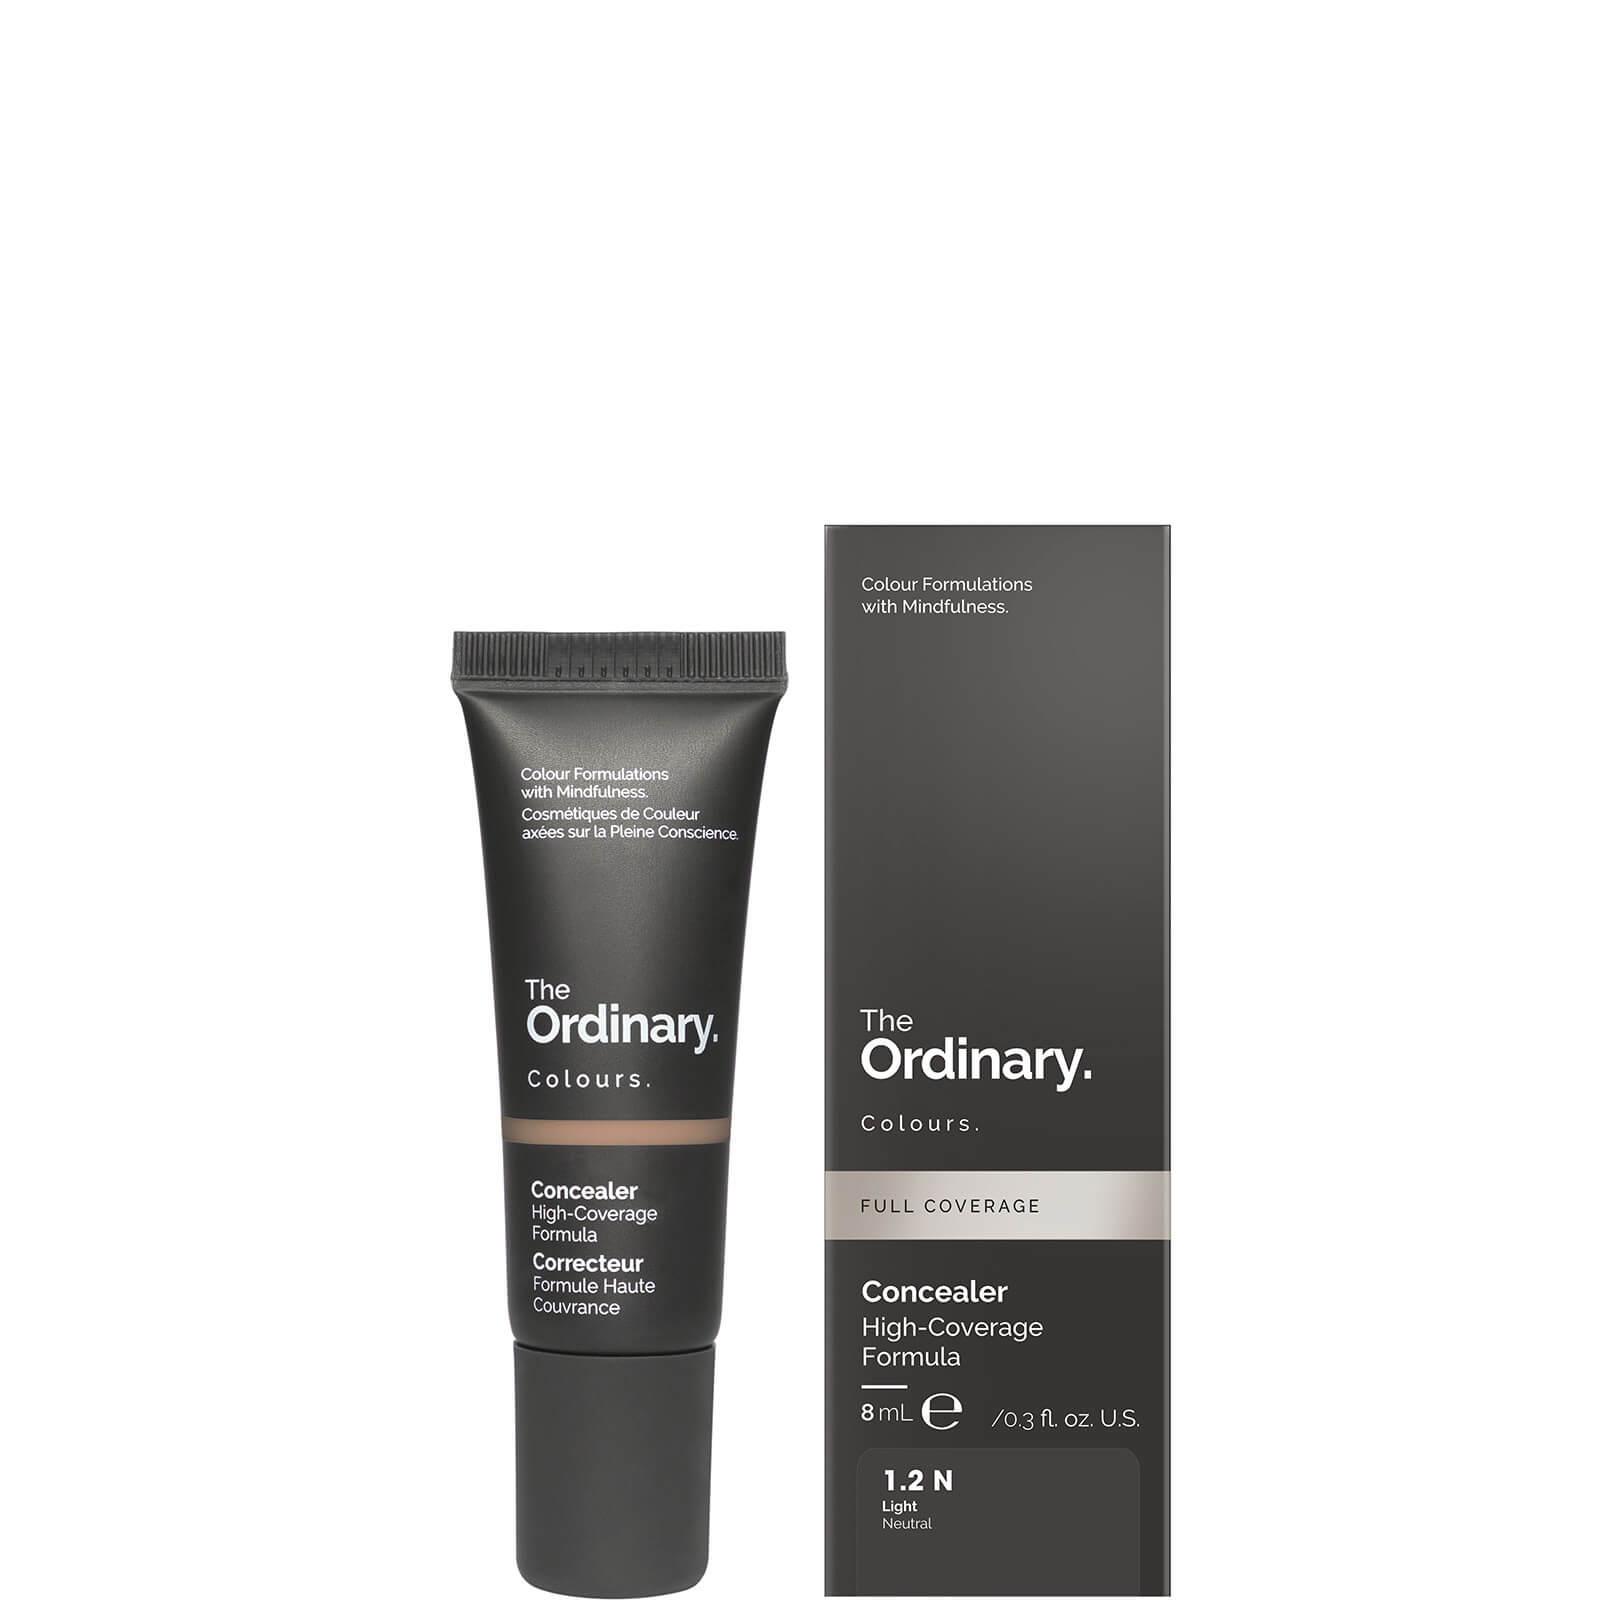 Купить The Ordinary Concealer 8ml (Various Shades) - 1.2 N